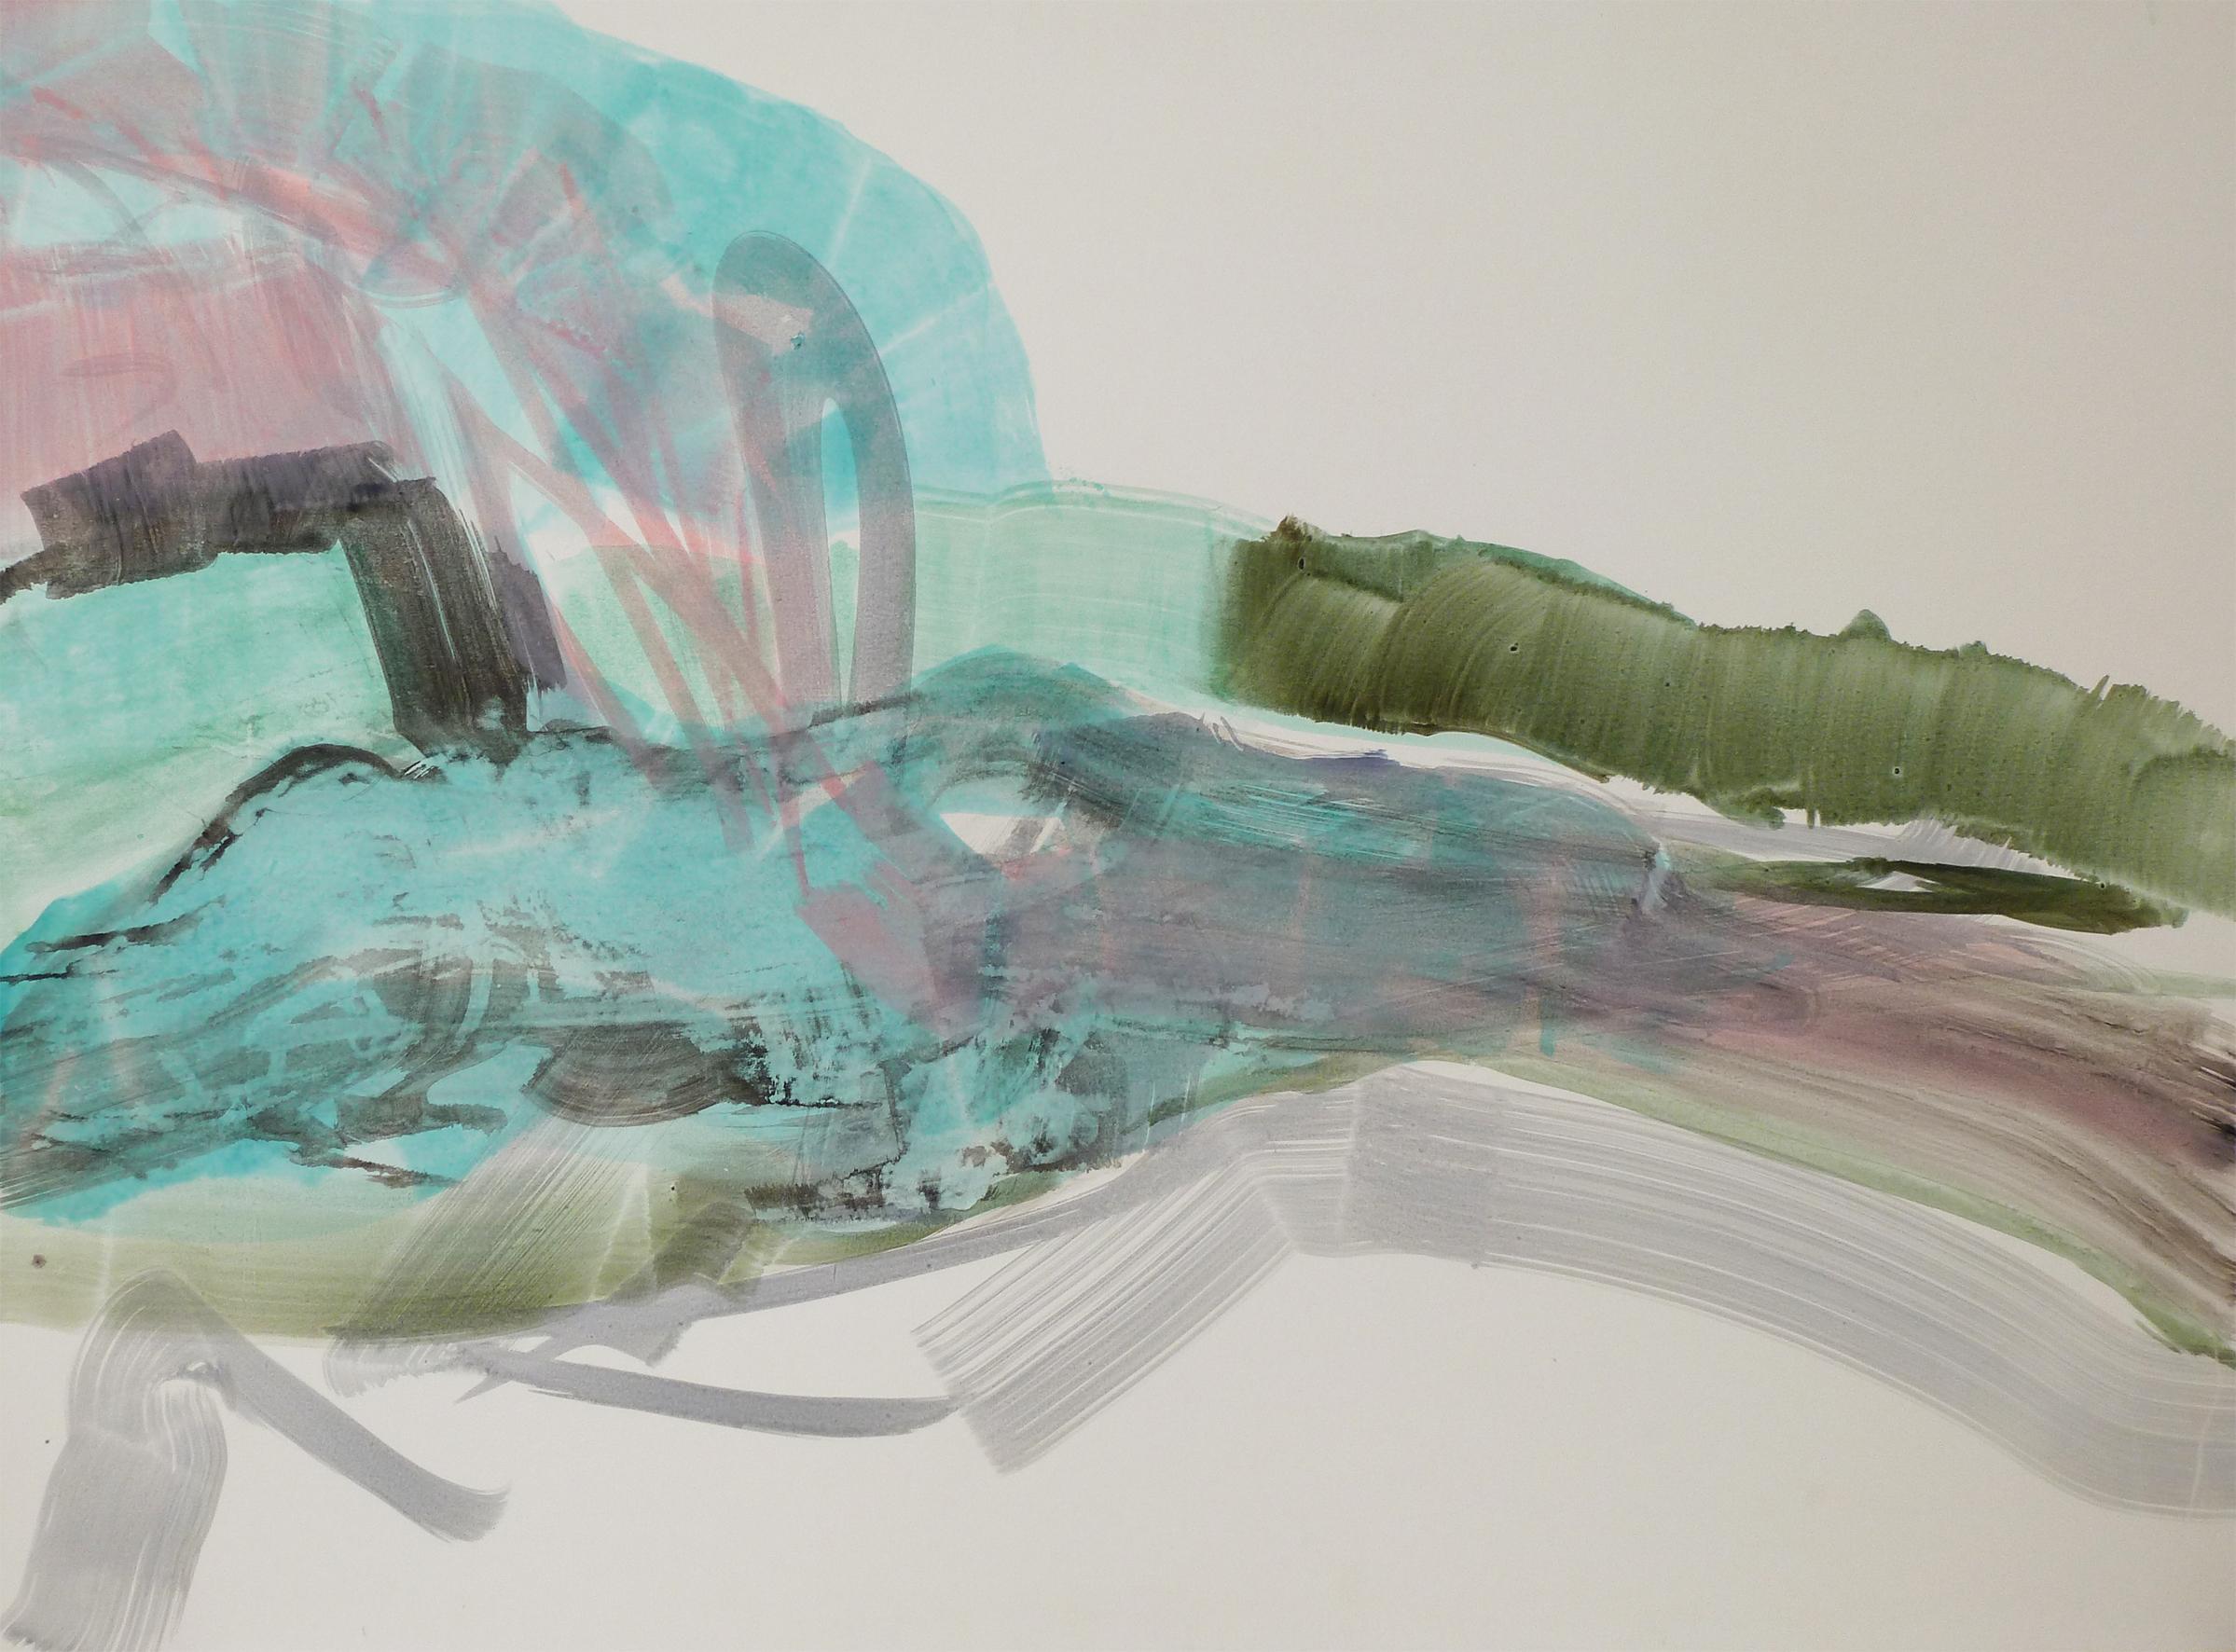 Hunsrück, 2011, Acryl auf Papier, 85 x 119 cm © Uta Weil, VG Bild-Kunst, Bonn